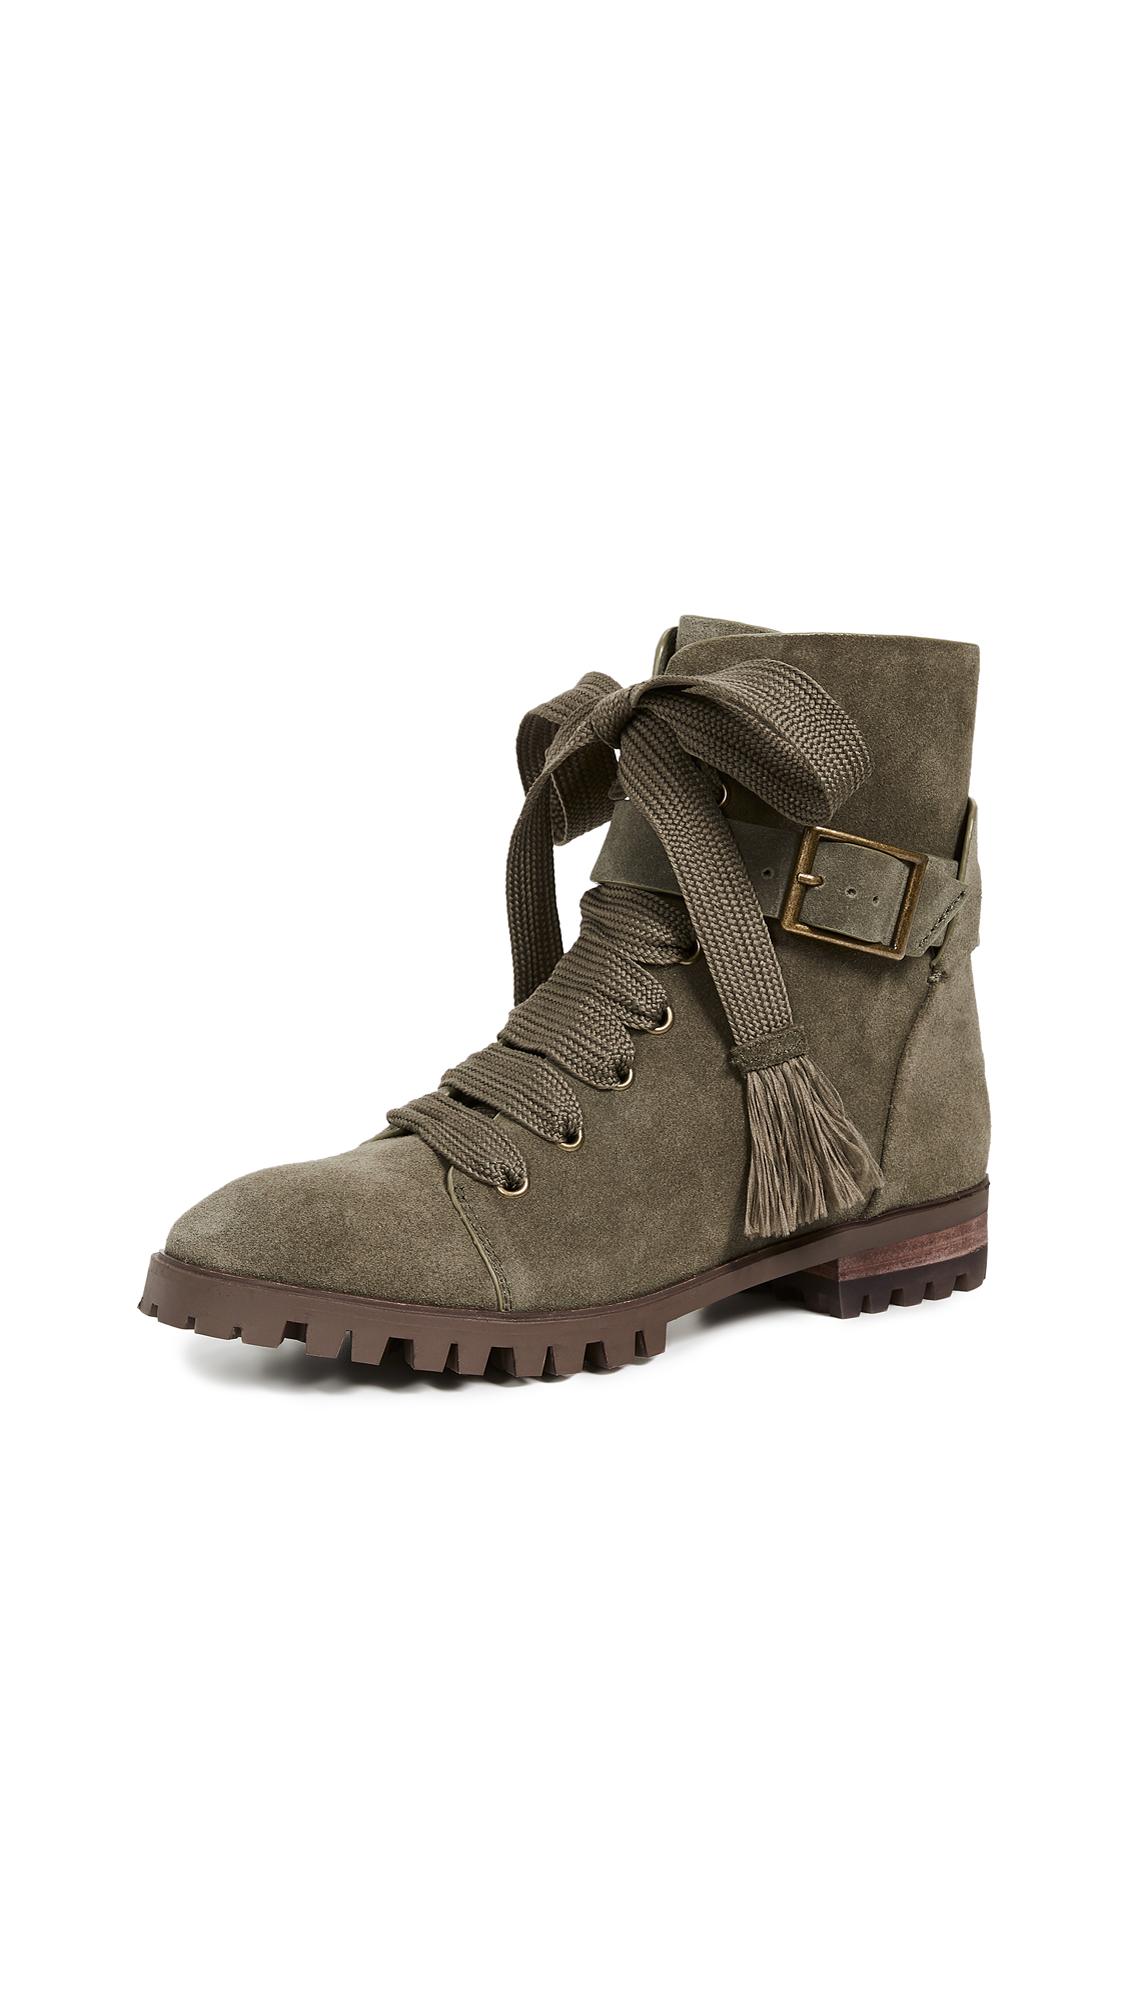 Splendid Celine Combat Boots - Fern